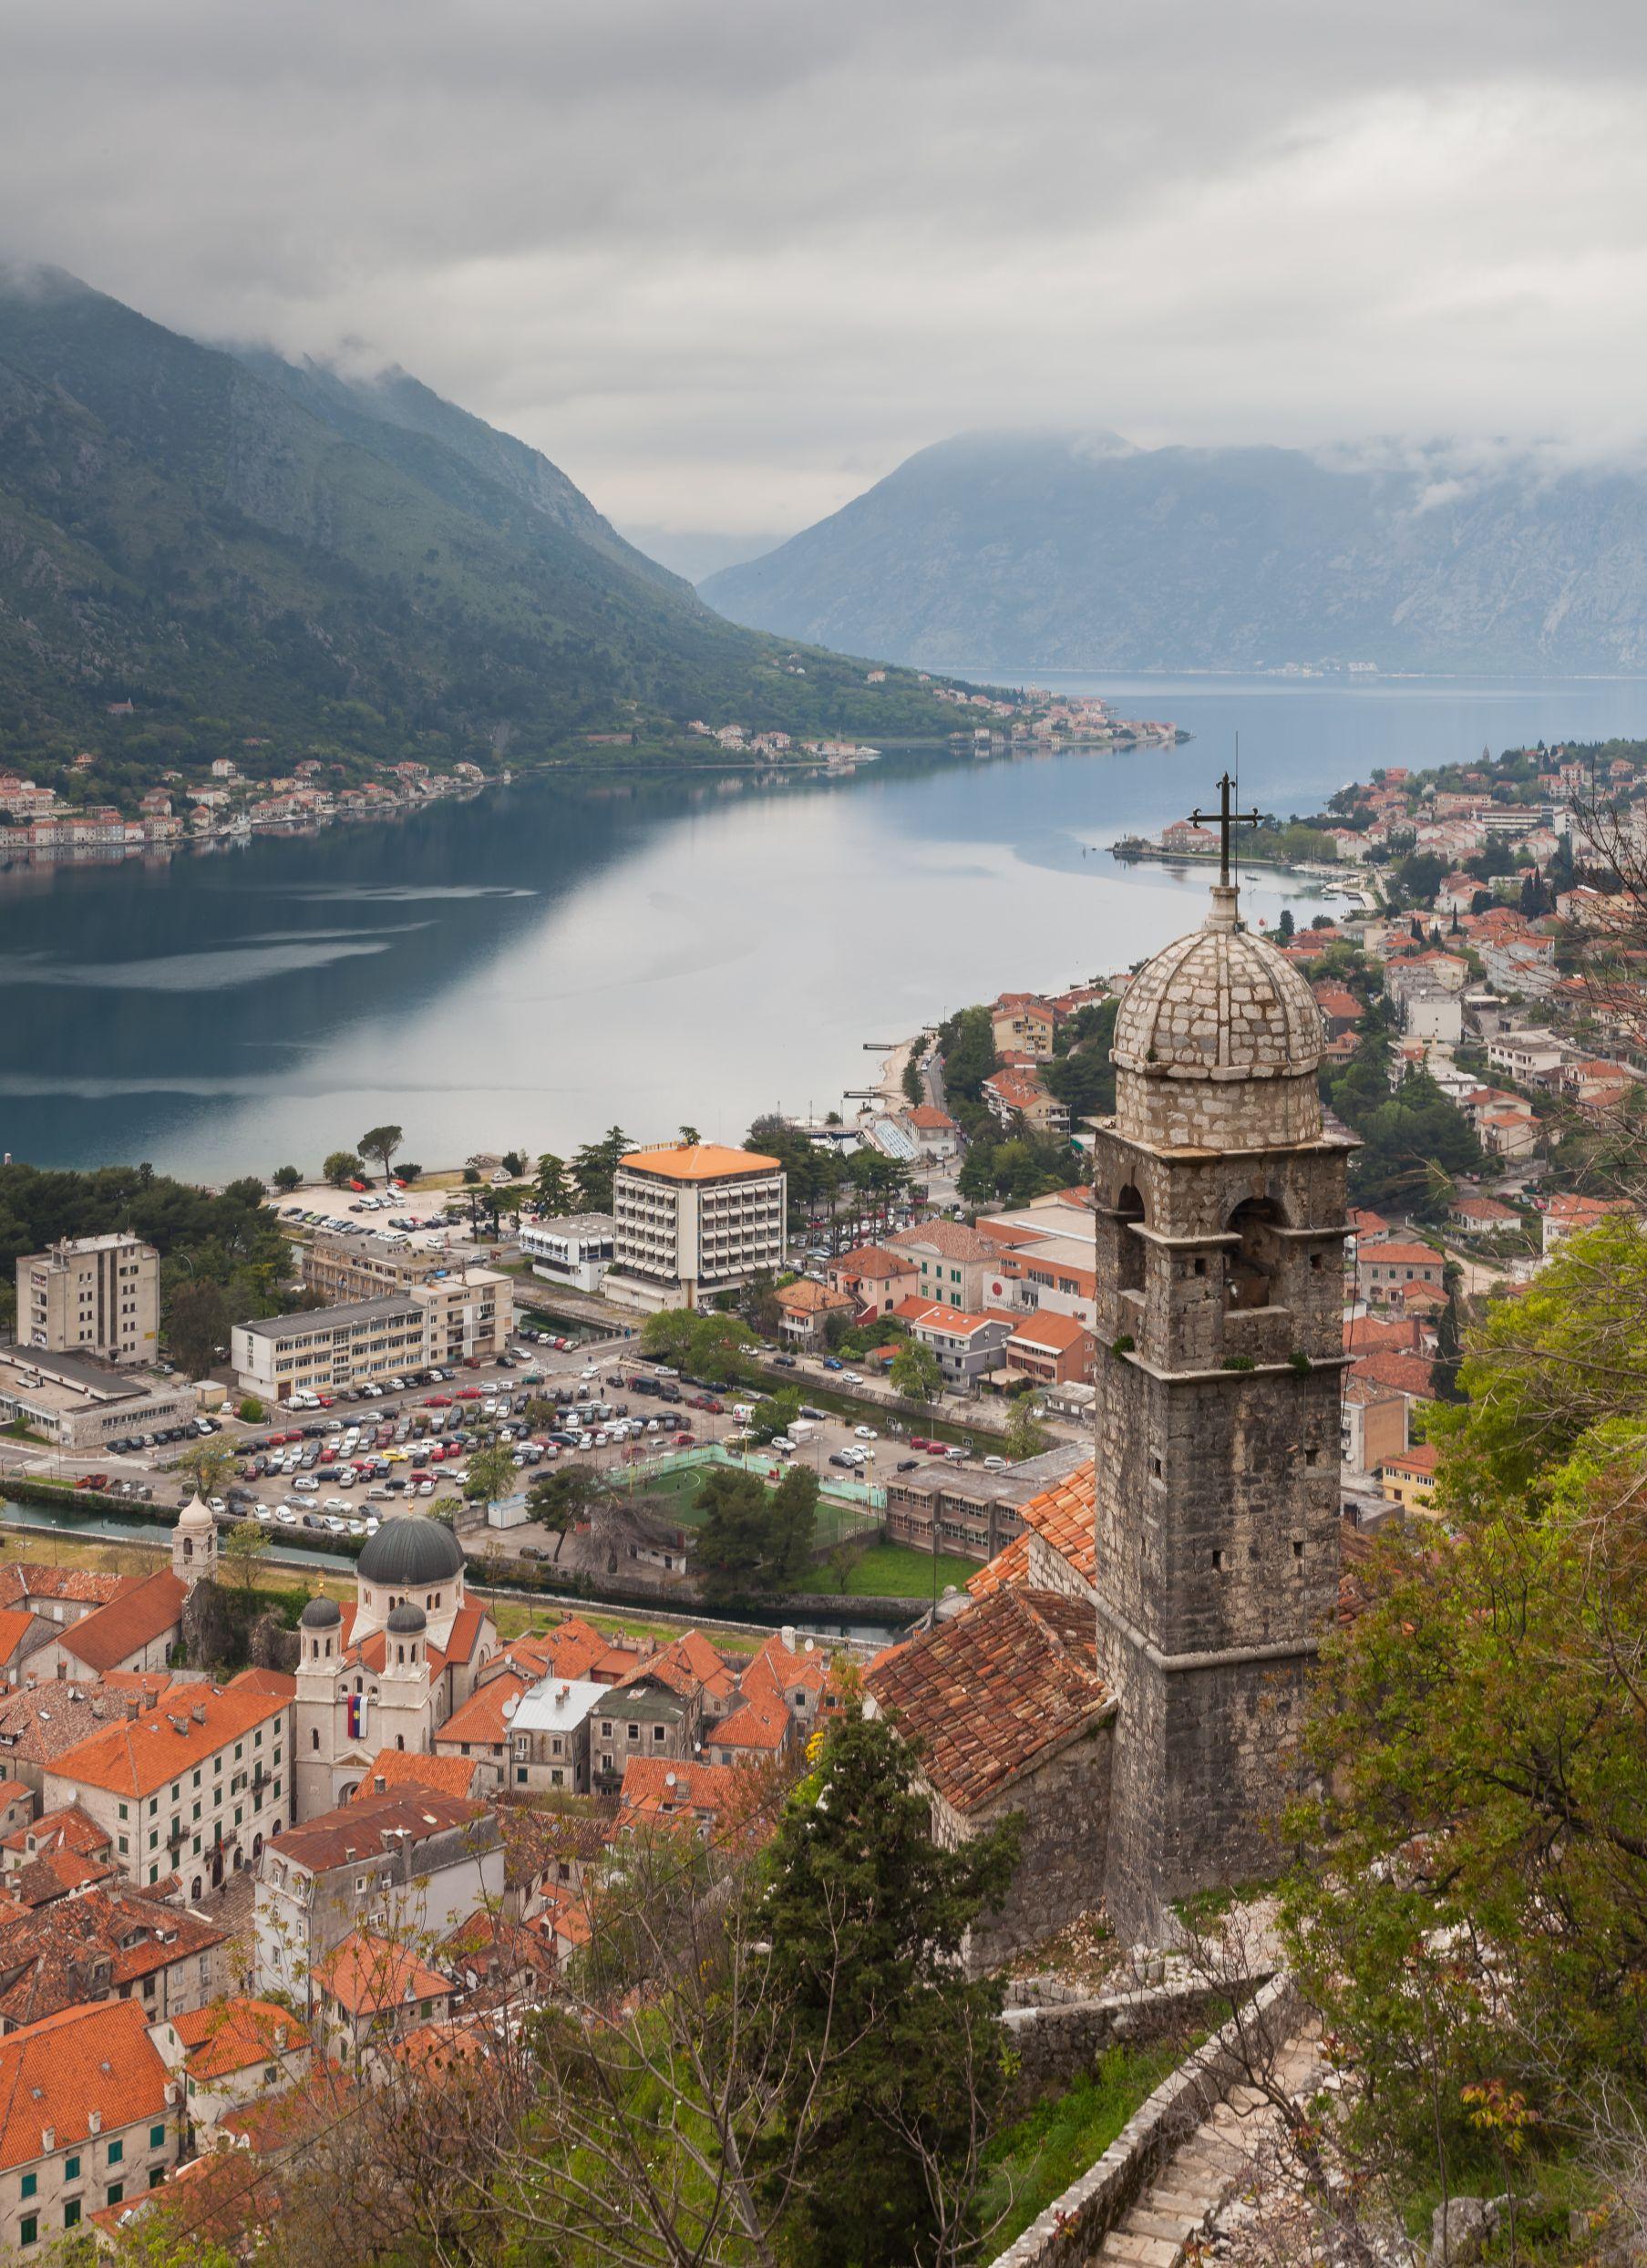 Kotor, Montenegro - All seasons 2 days micro tour from Dubrovnik to visit Montenegro and Bosnia. Private minivan tour by Monterrasol Travel.